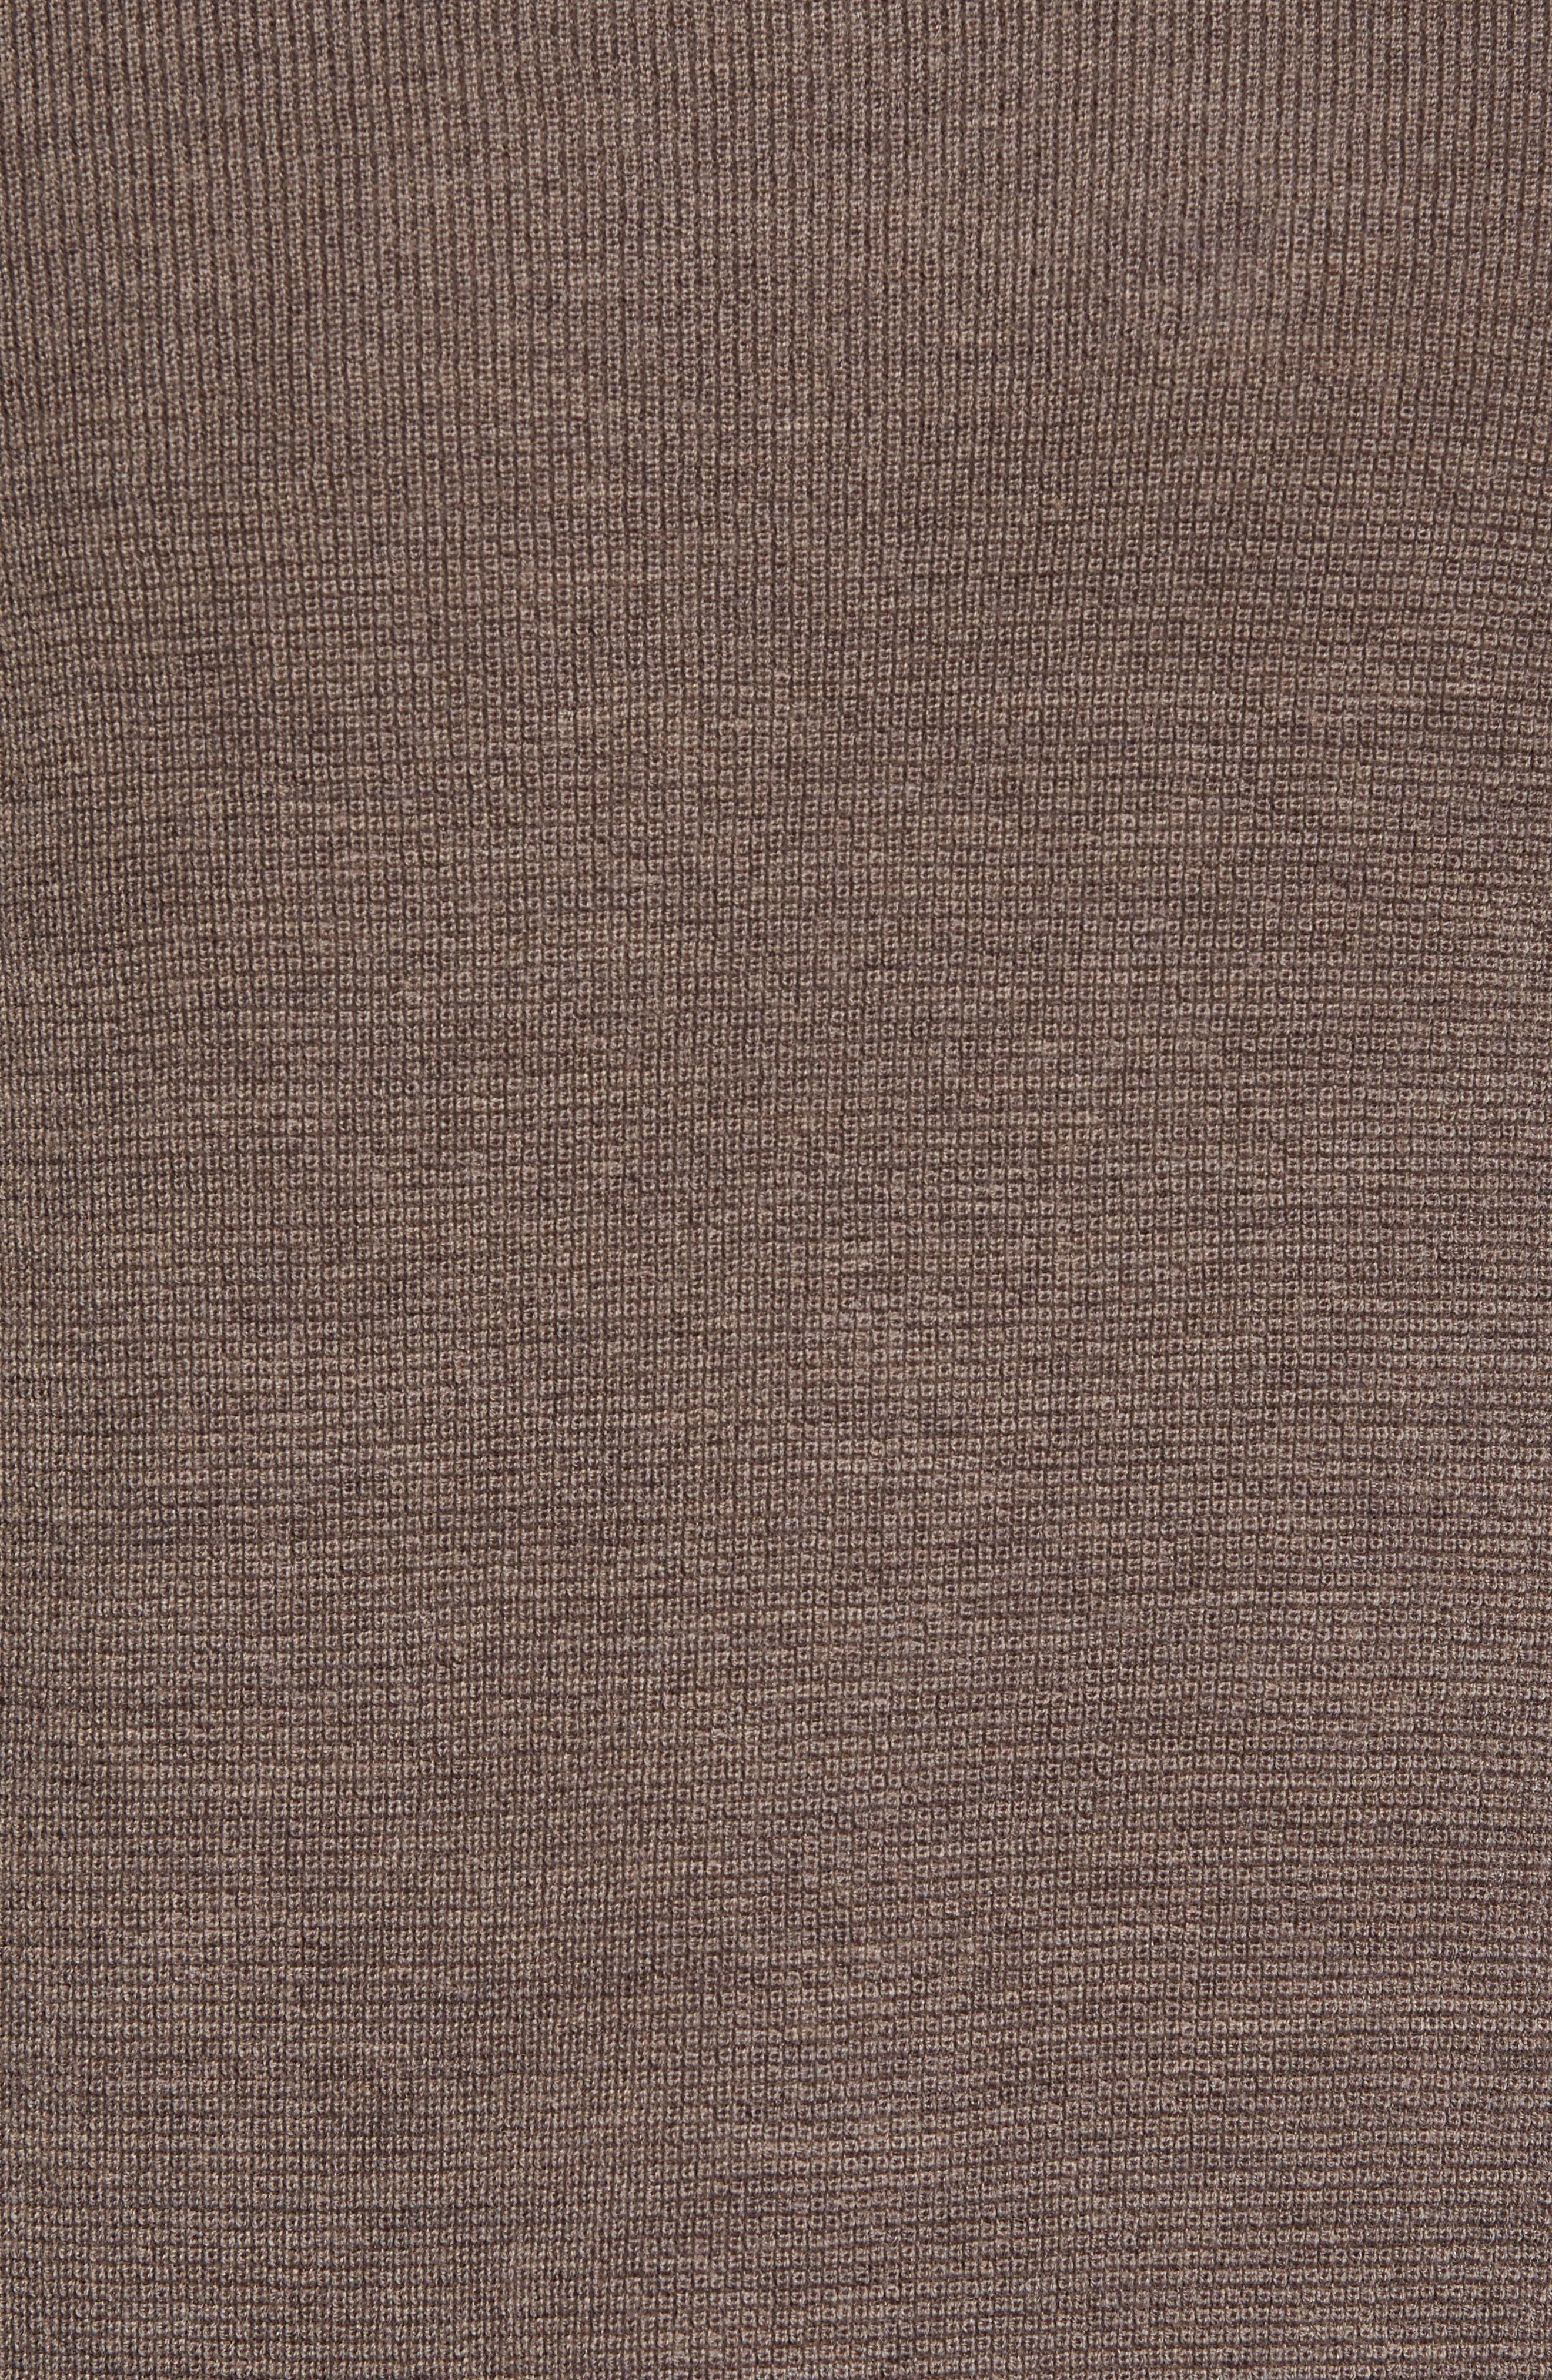 Huxley Merino Sweater,                             Alternate thumbnail 5, color,                             LIGHT COFFEE